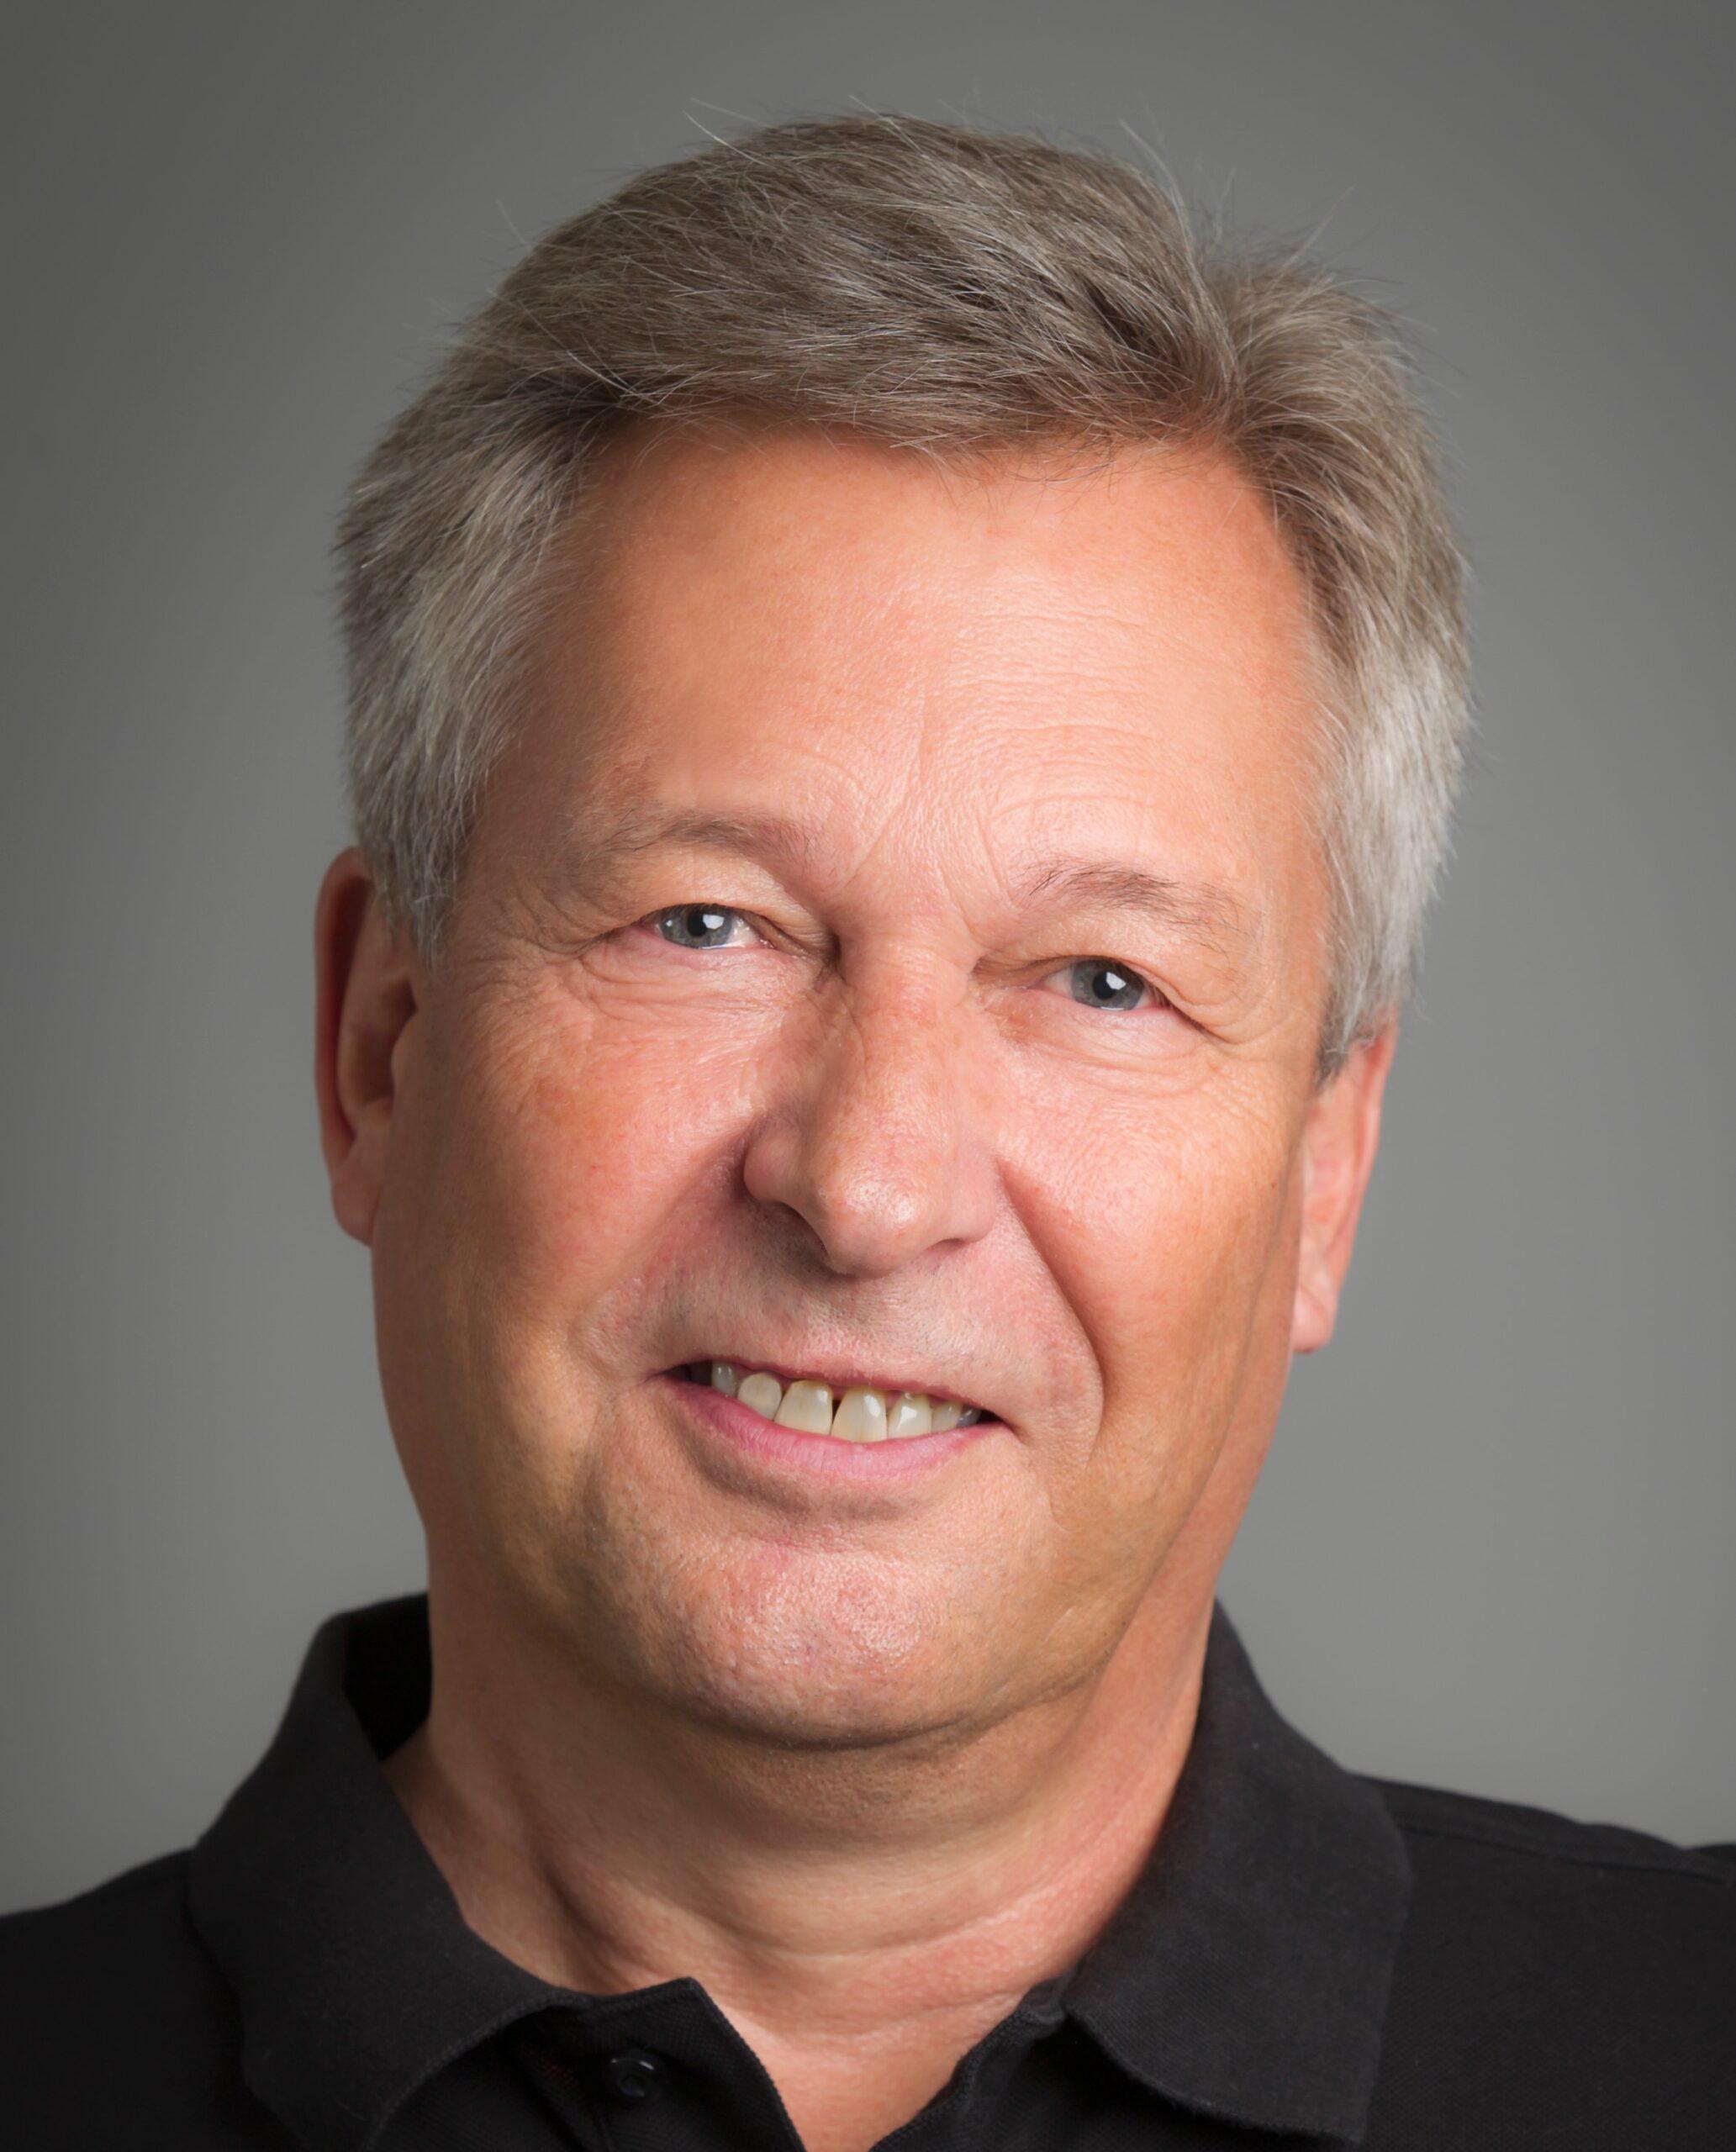 Geert Egger scaled